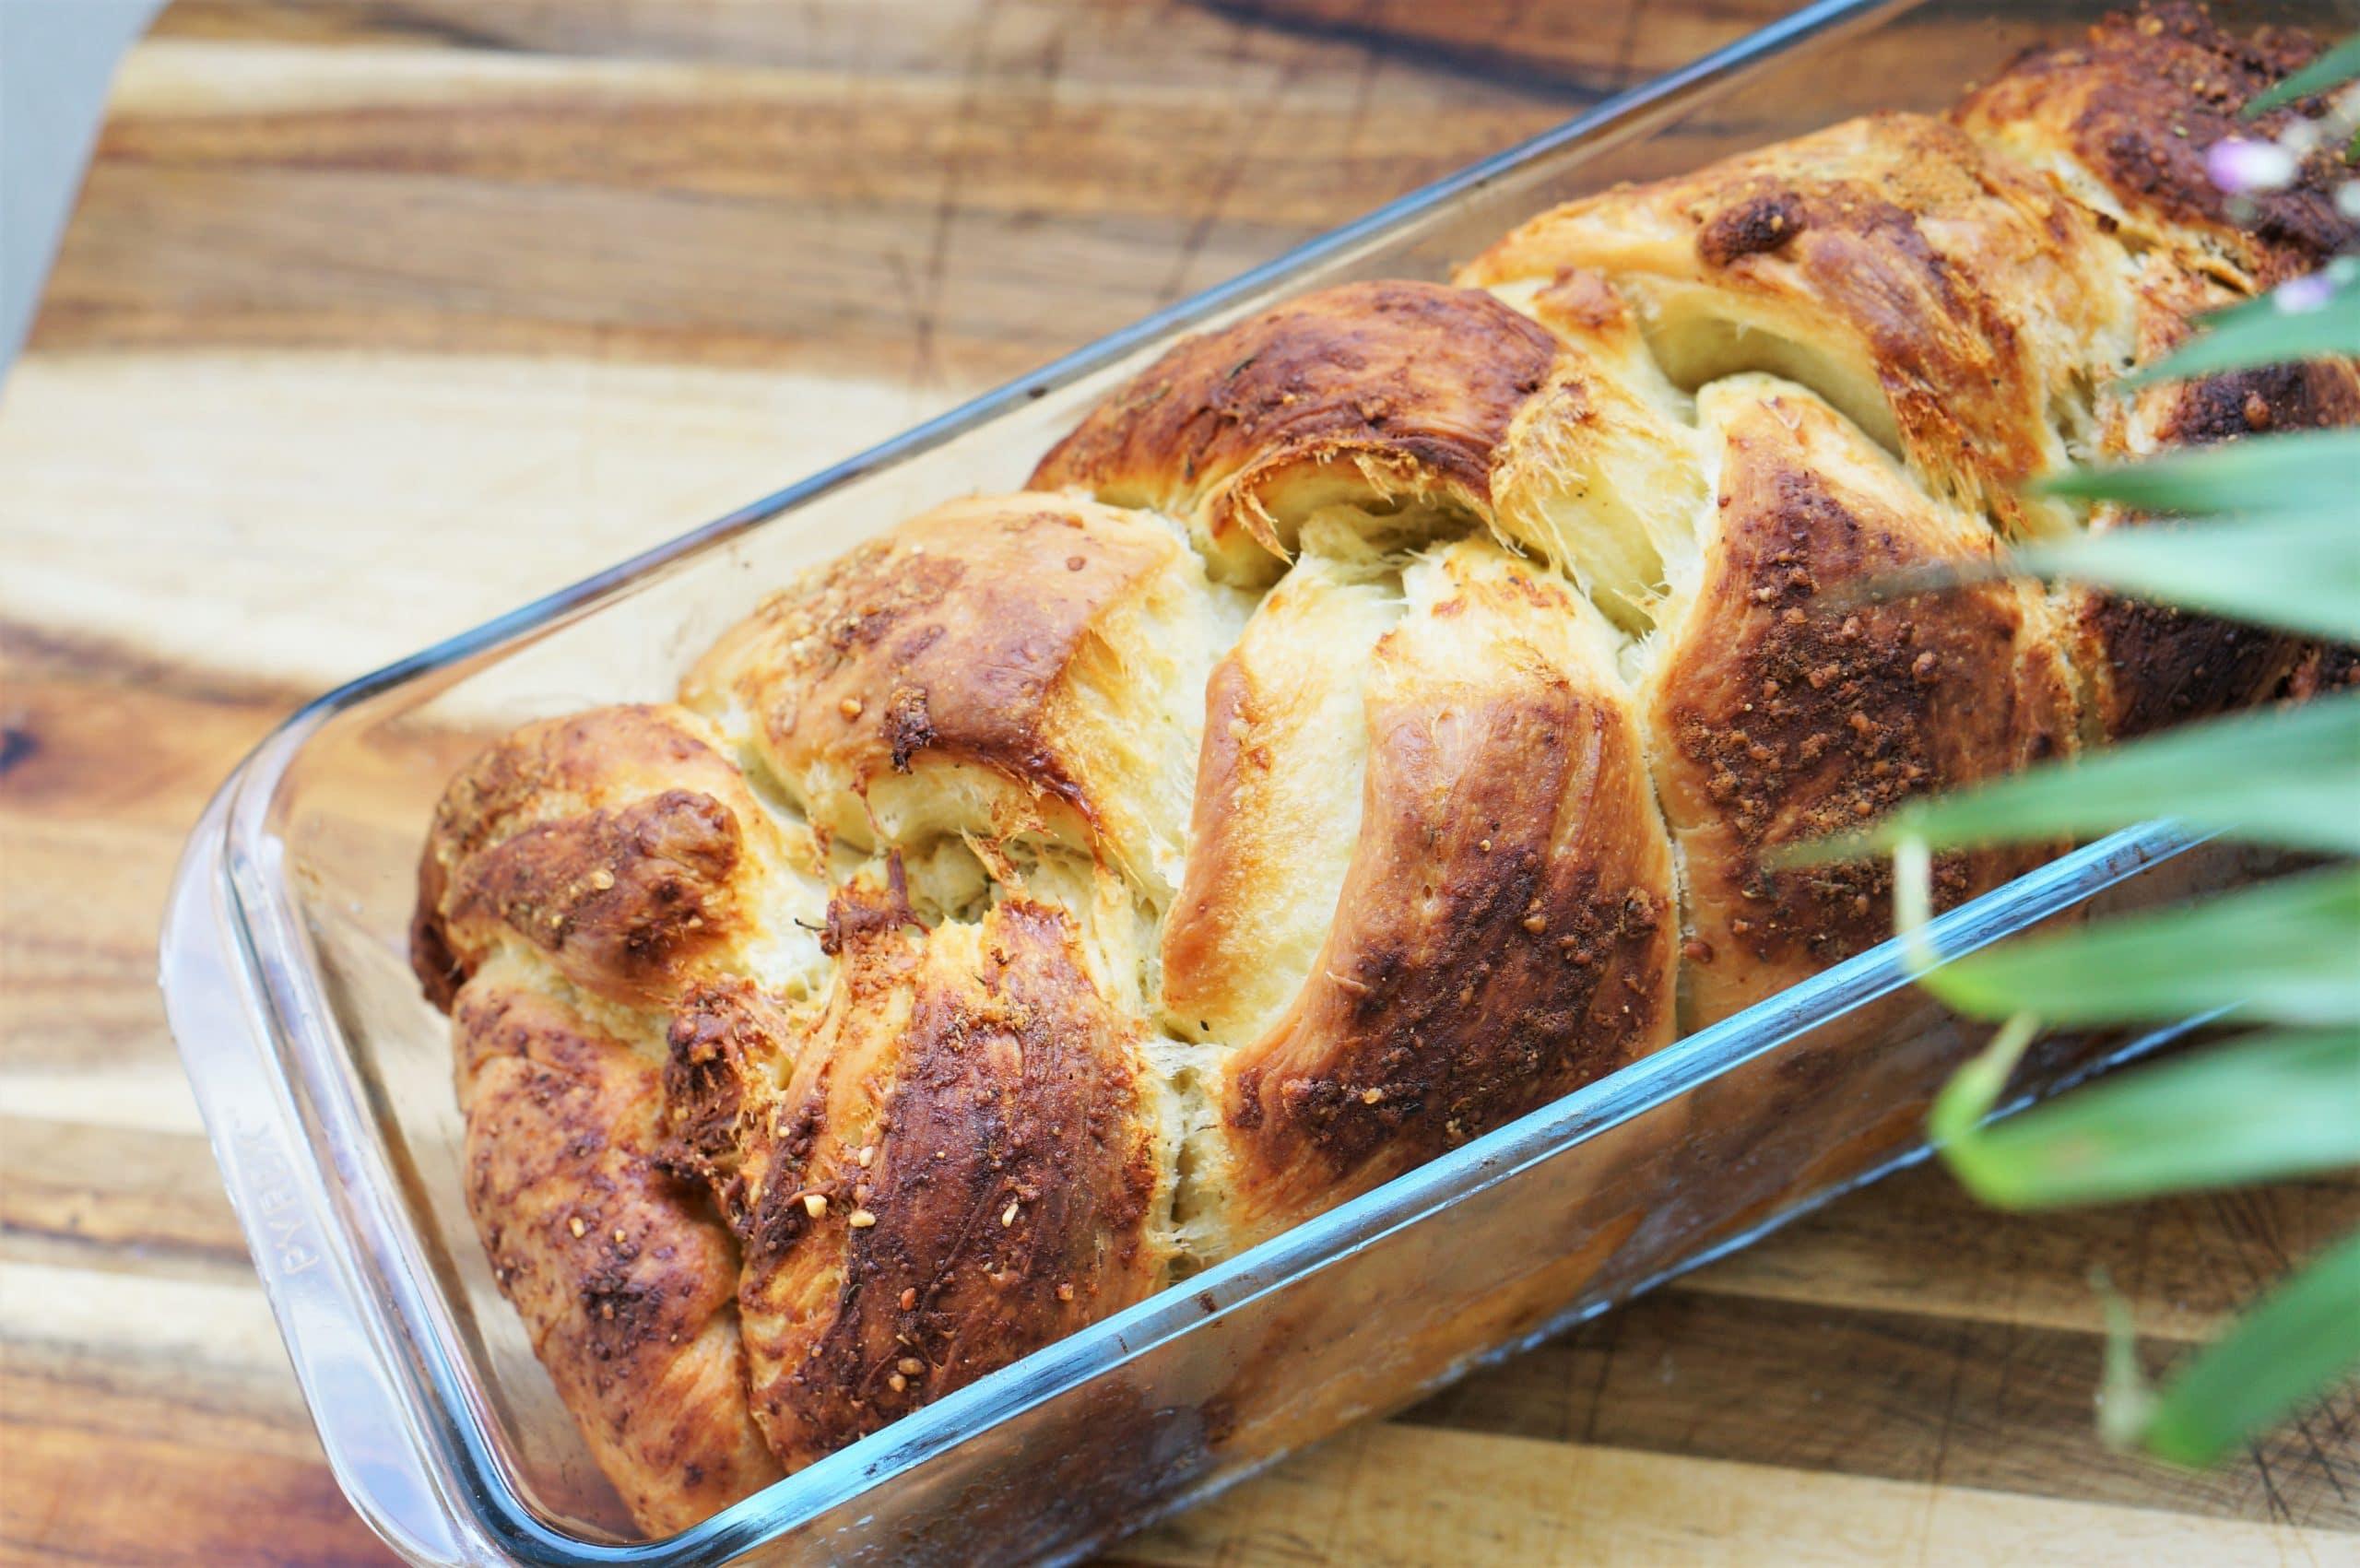 pain ail parmesan, knoblauchbrot, garlic bread